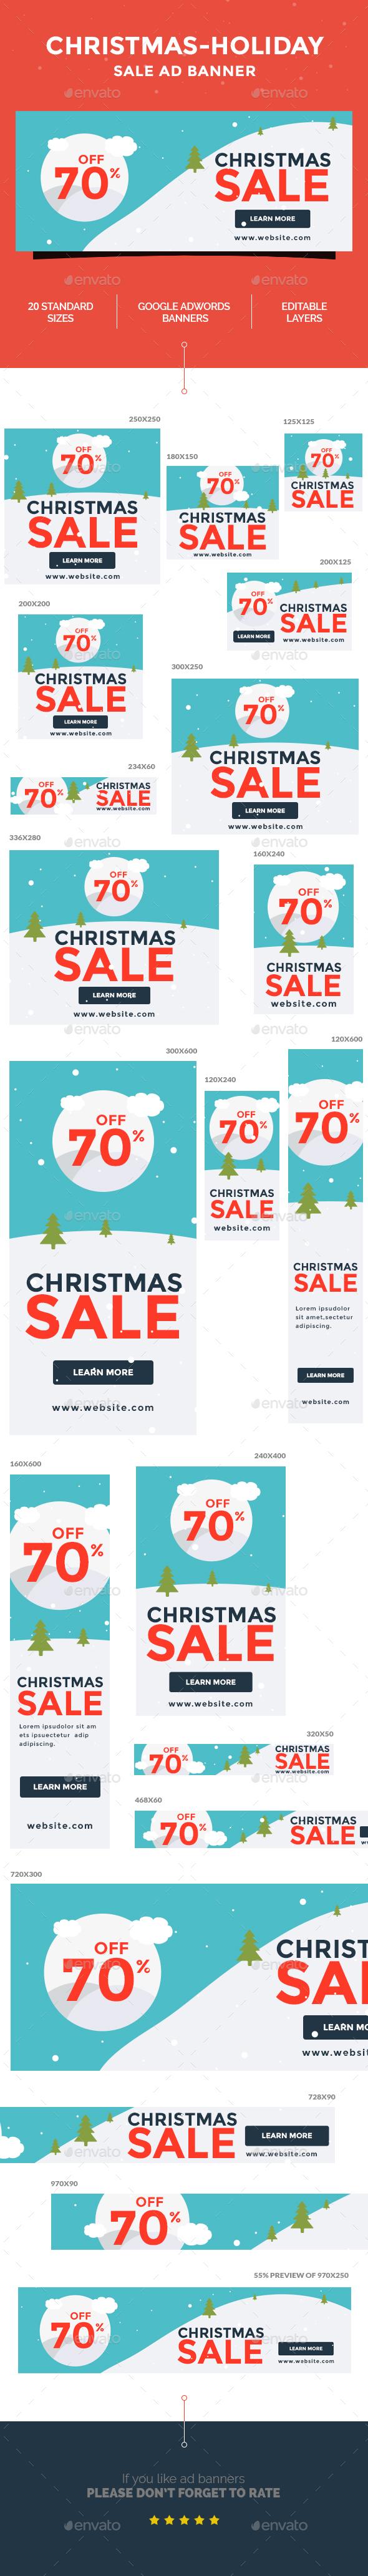 christmas holiday ad banner christmas holidays design christmas holiday ad banner banners ads web elements